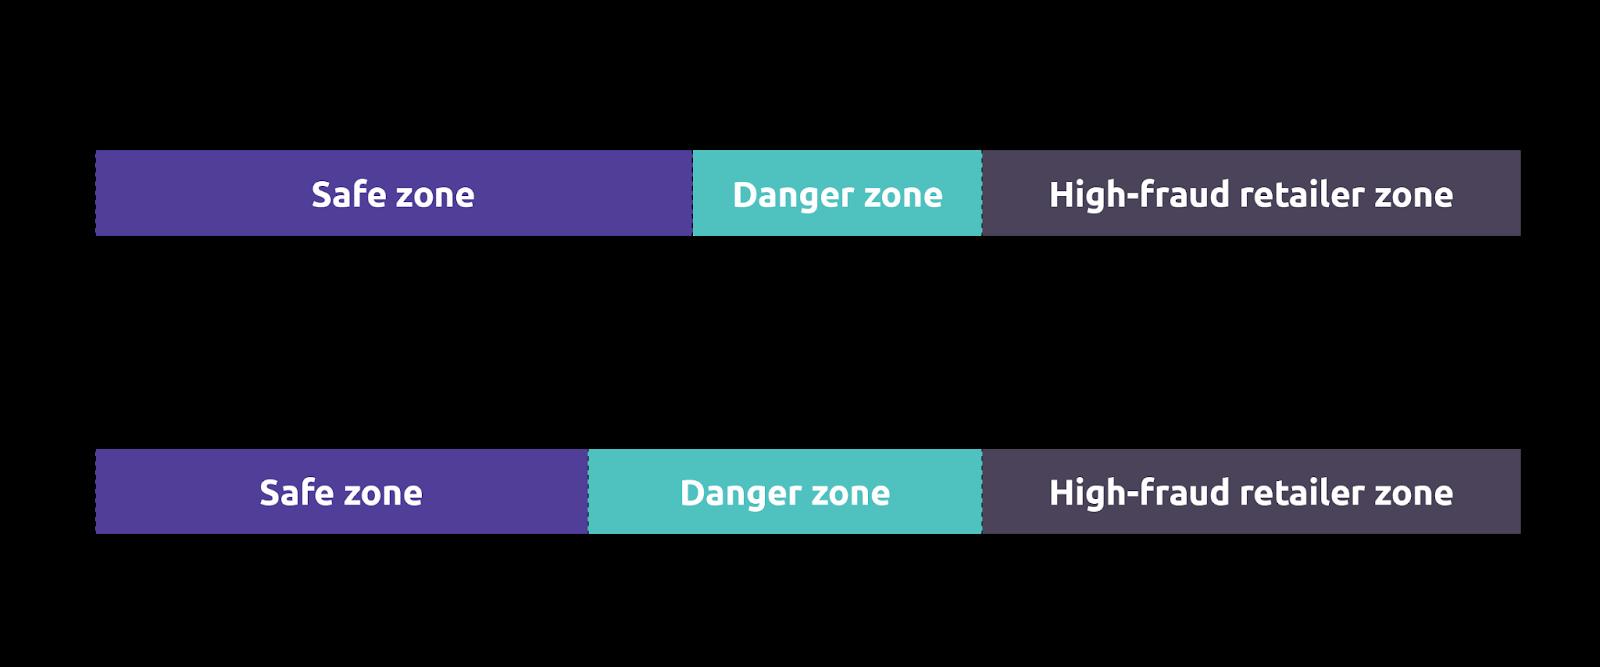 Chargeback safe zone